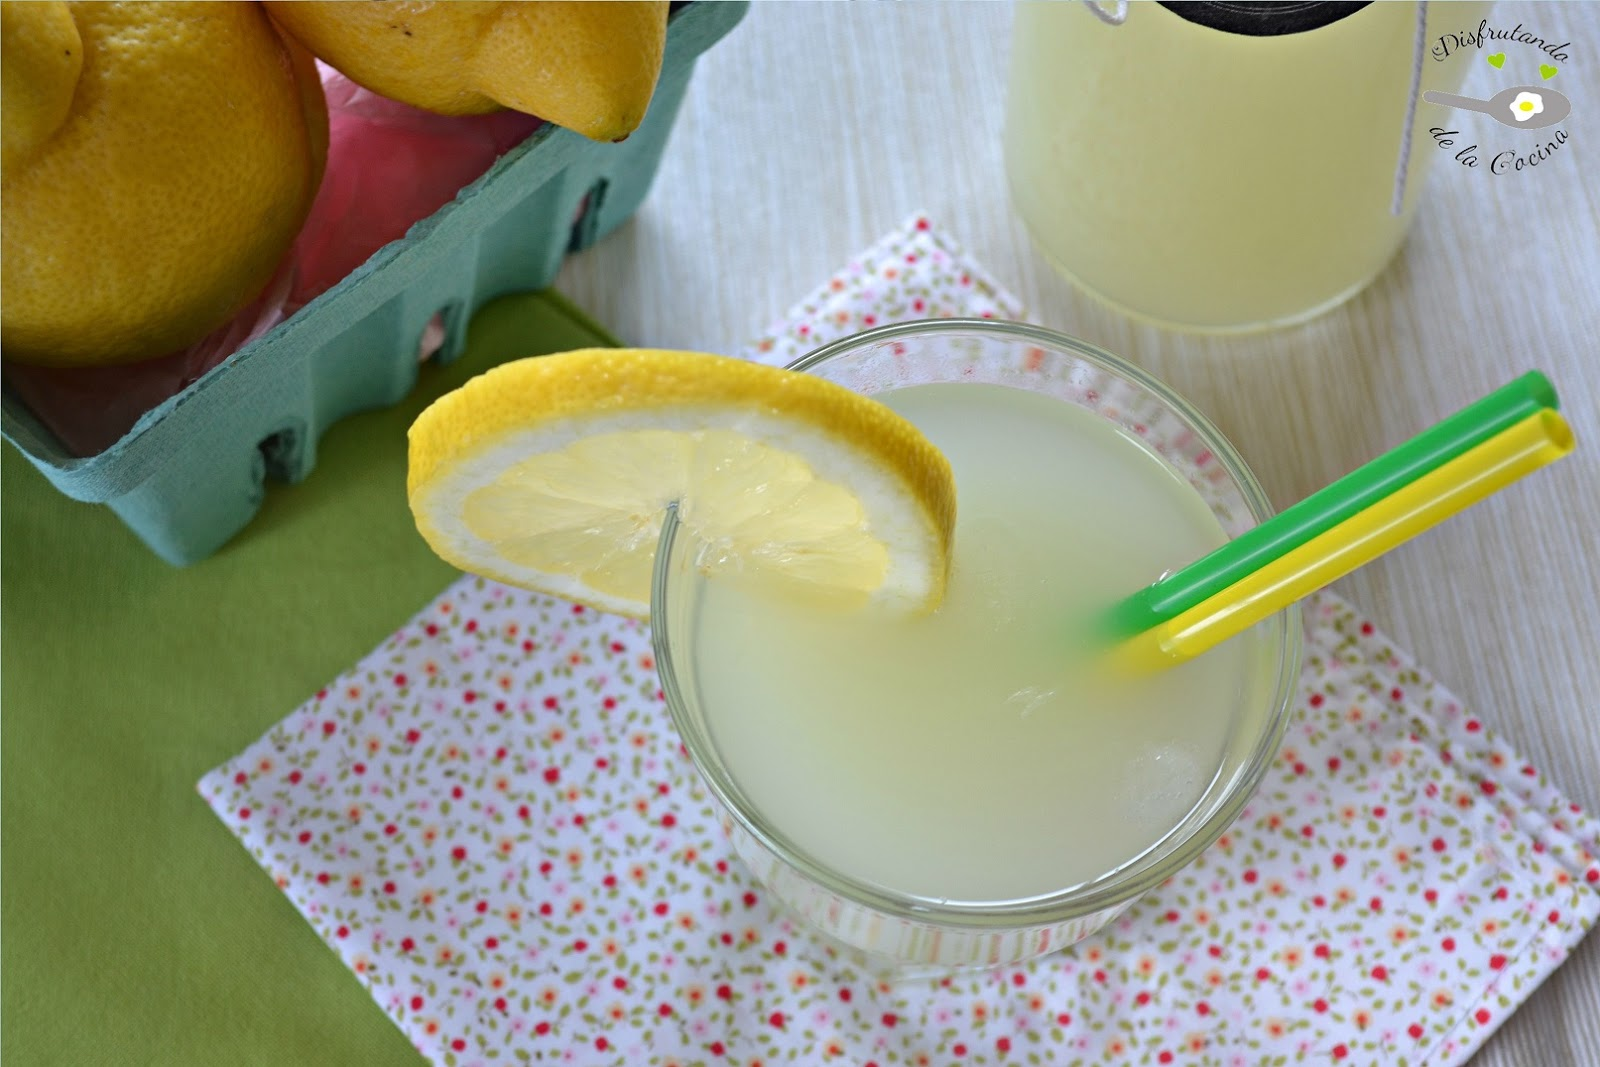 Limonada casera (Receta fácil)